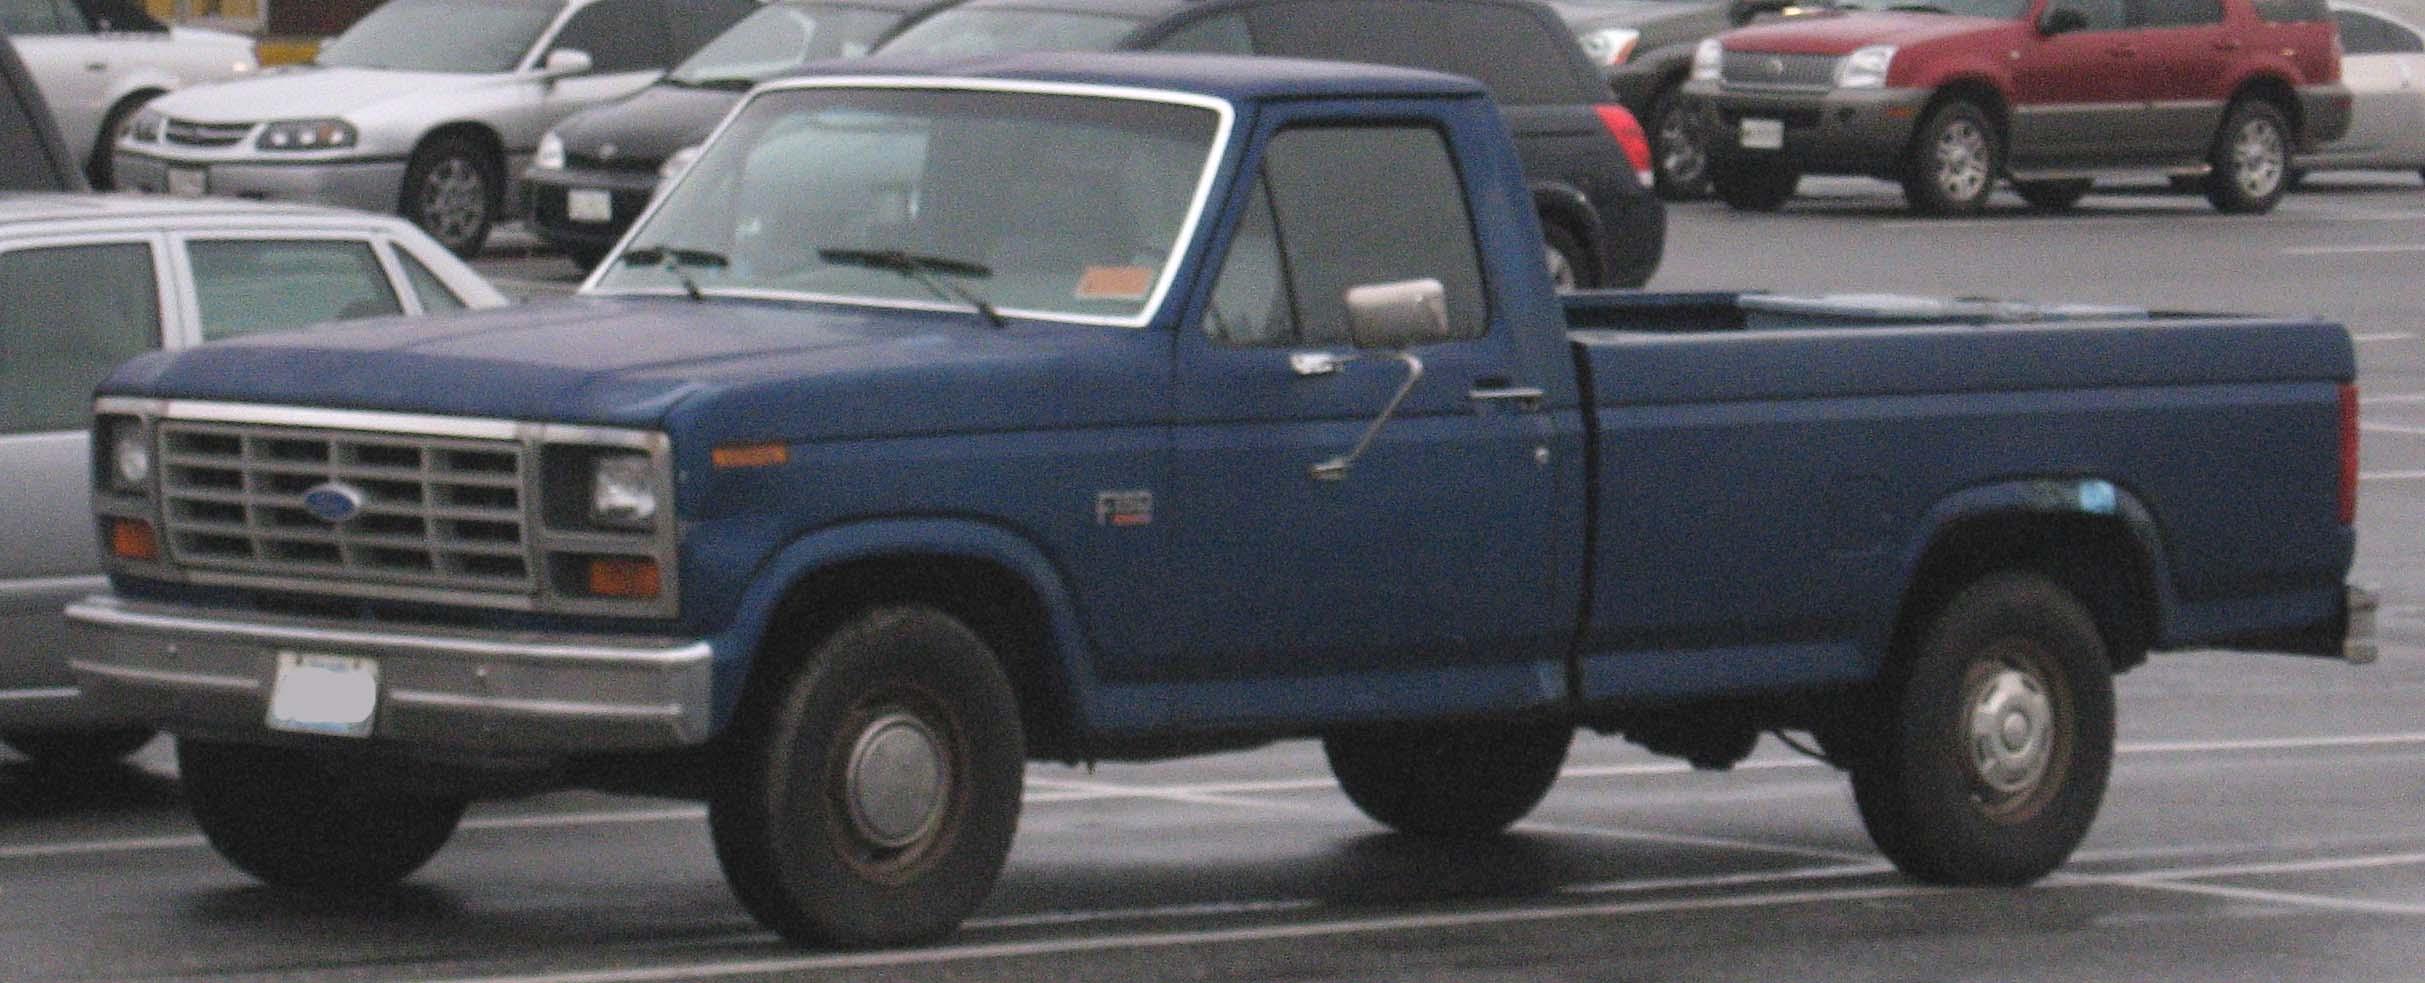 File:80-86 Ford F-150.jpg - Wikimedia Commons